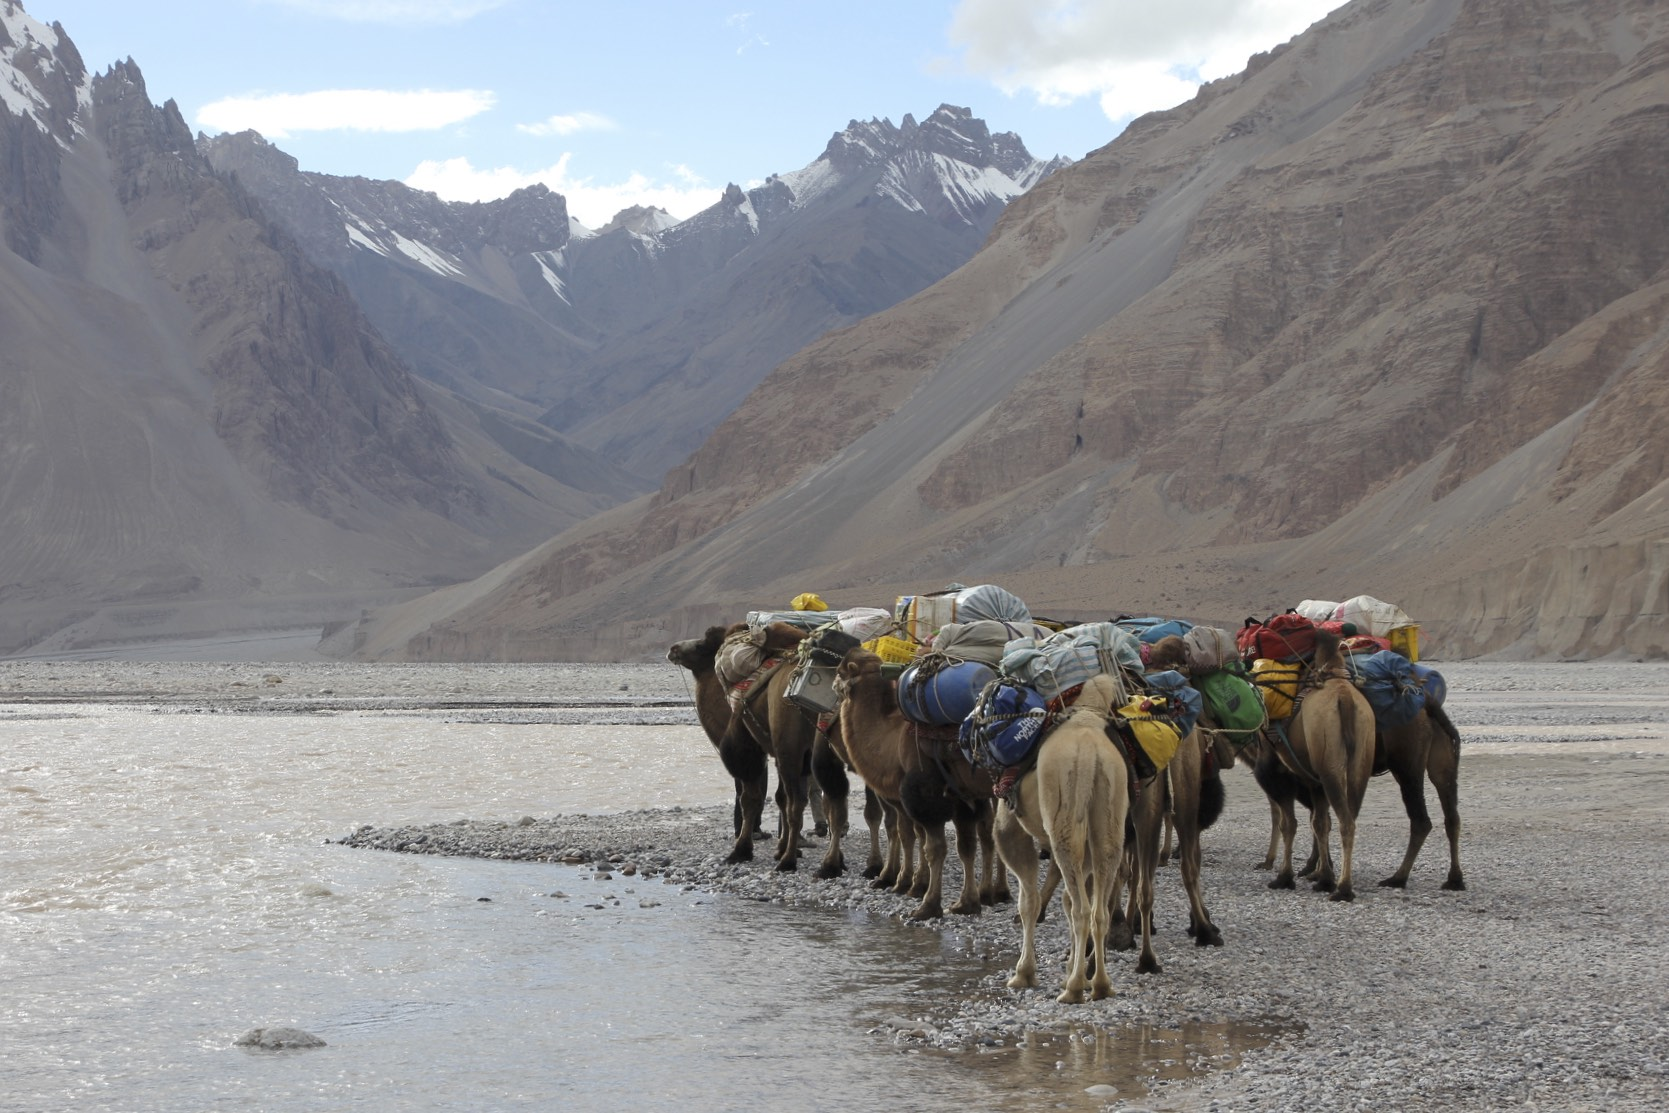 Preparing to cross the Shakgskam River